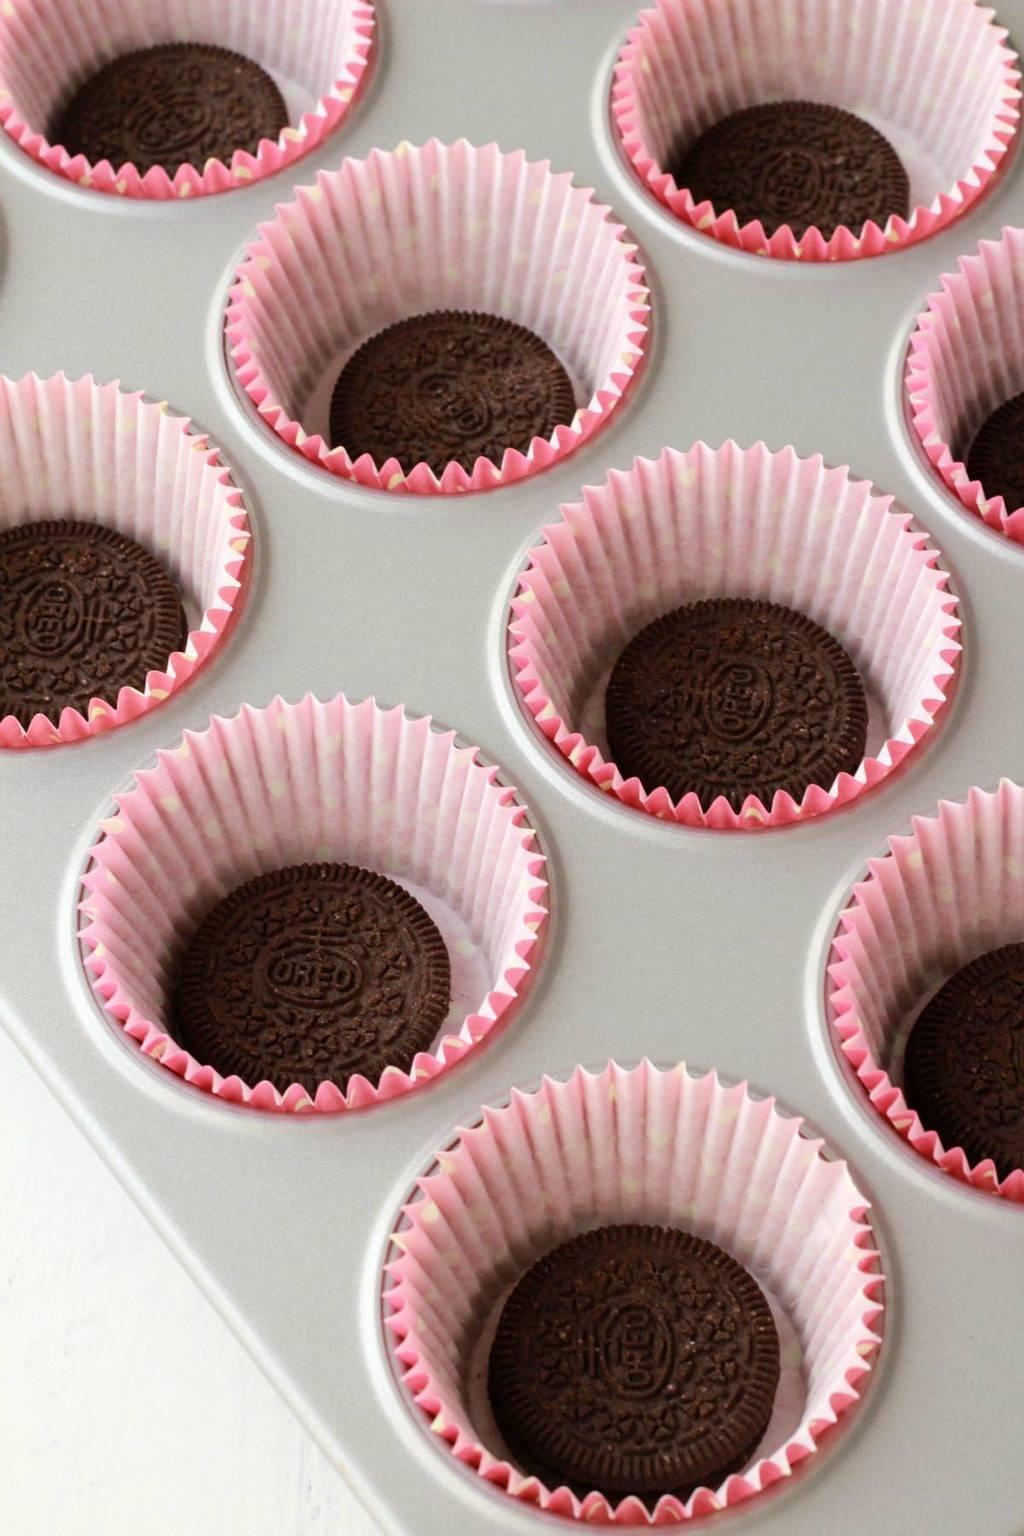 Making Oreo Cupcakes #vegan #lovingitvegan #oreocupcakes #cupcakes #dessert